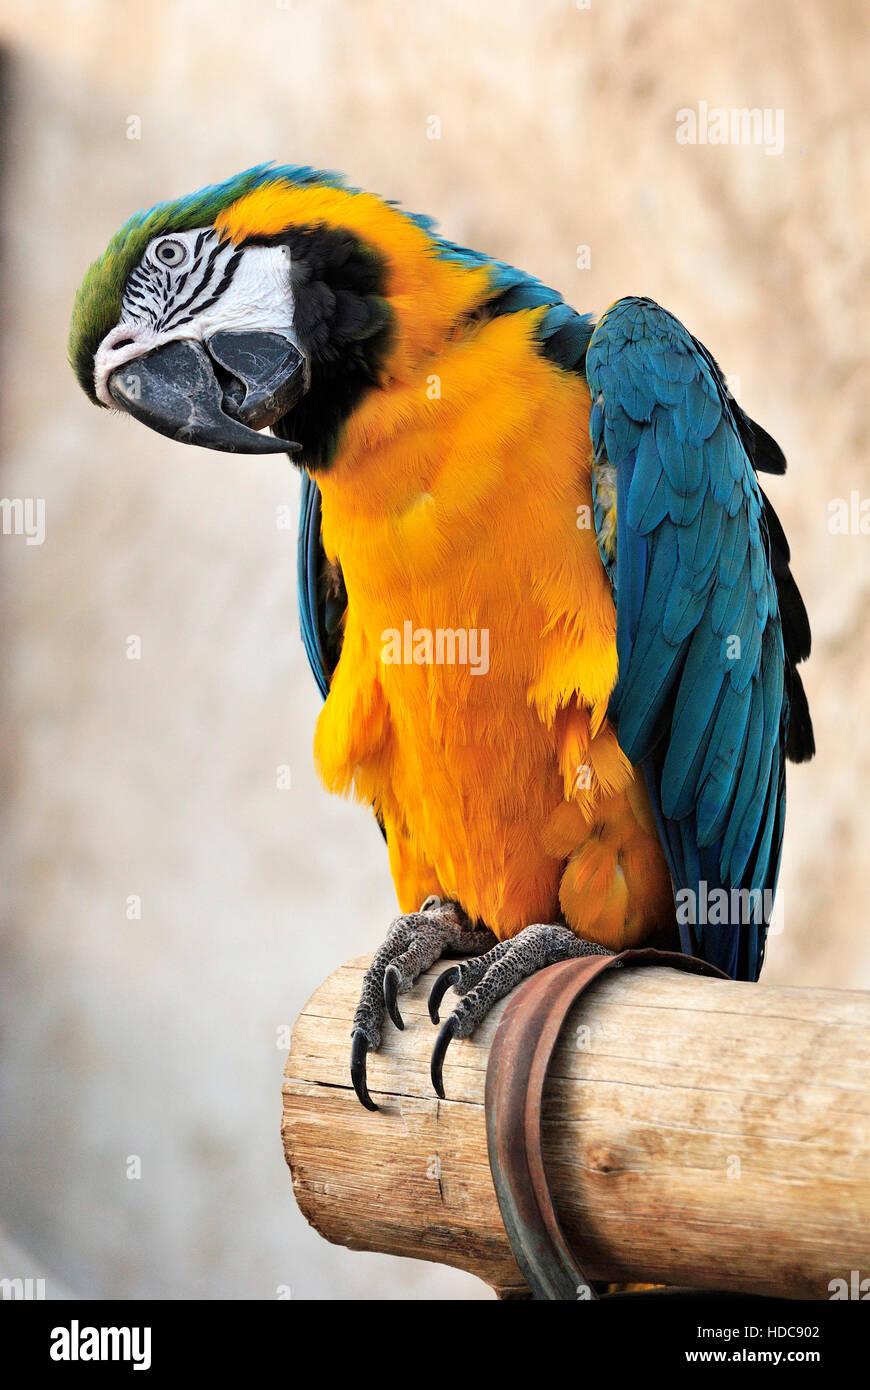 Blaue und gelbe Aras (Ara Ararauna) bei Vogel Souk in Doha, Katar. Stockbild